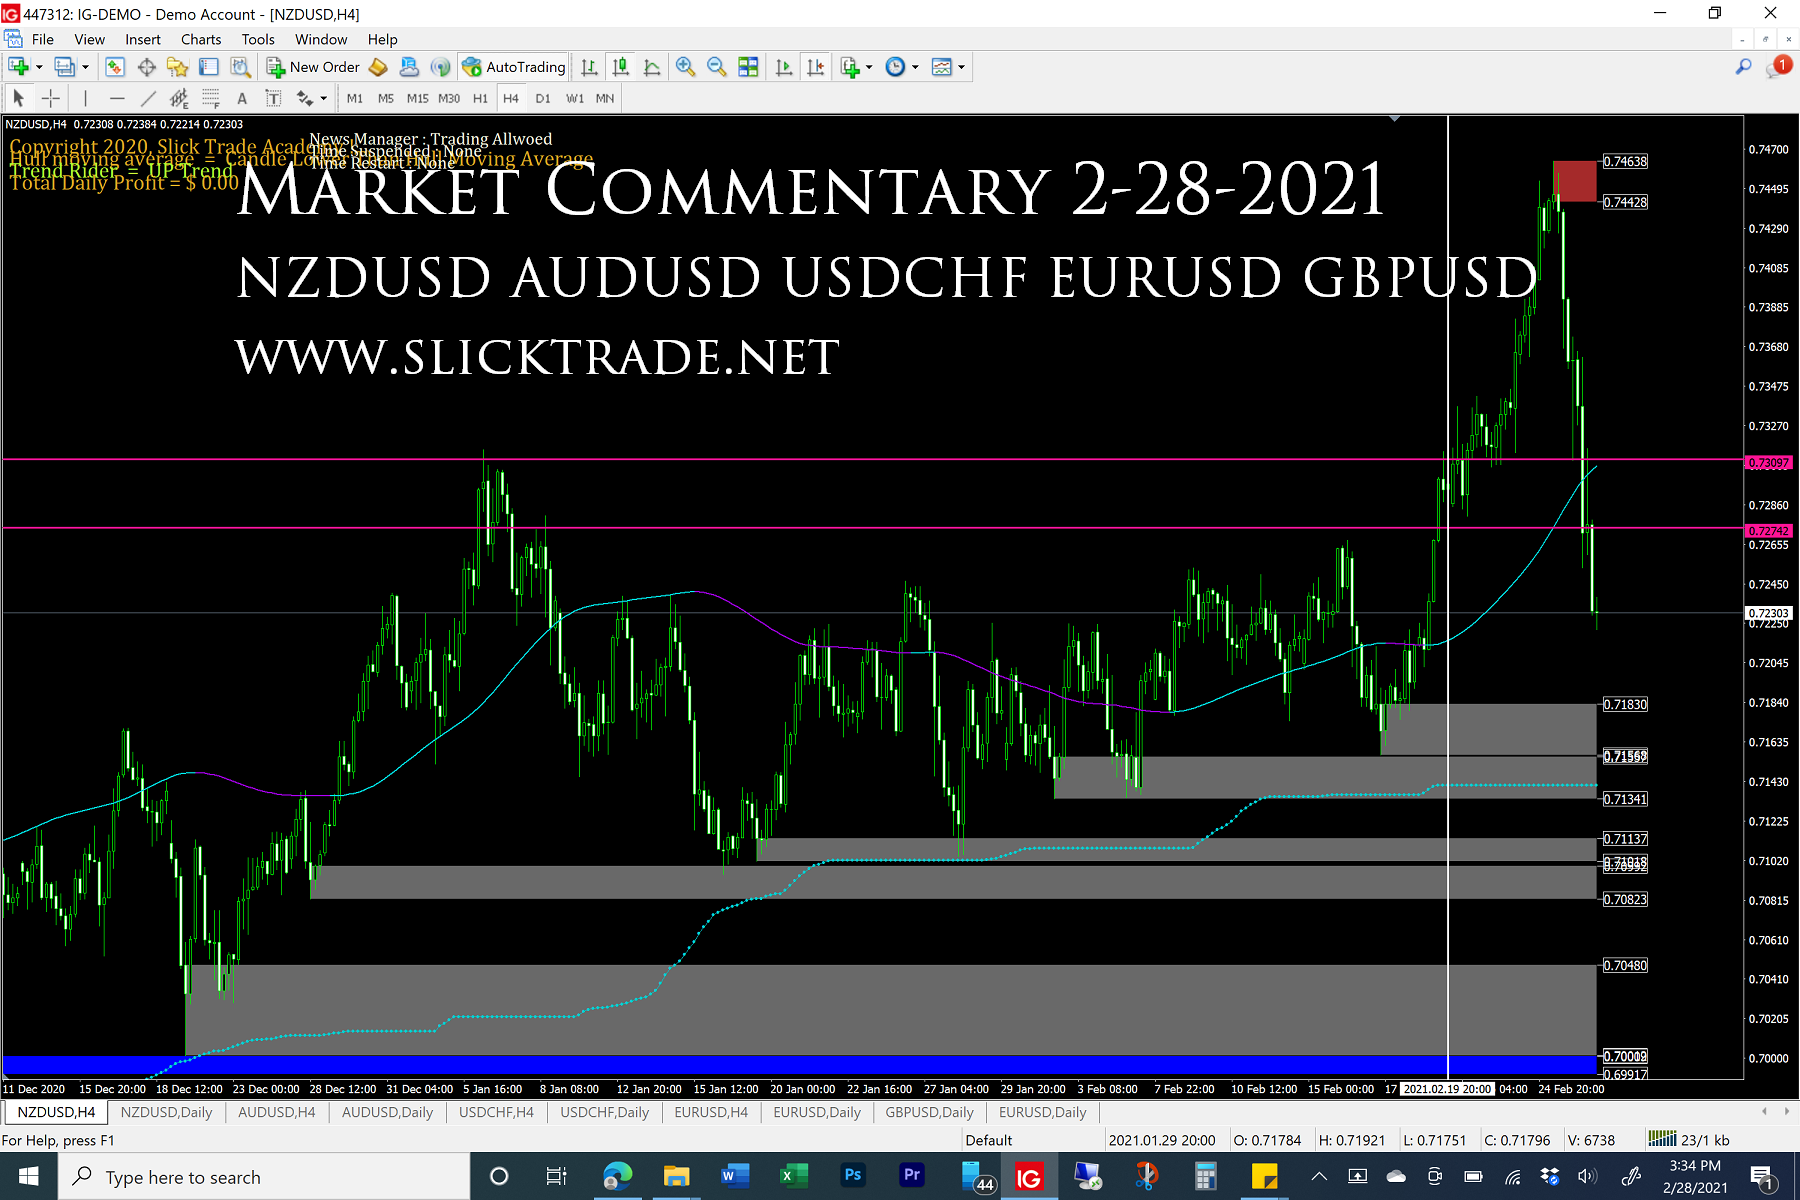 Market Commentary 2-28-2021 - NZDUSD AUDUSD USDCHF EURUSD GBPUSD